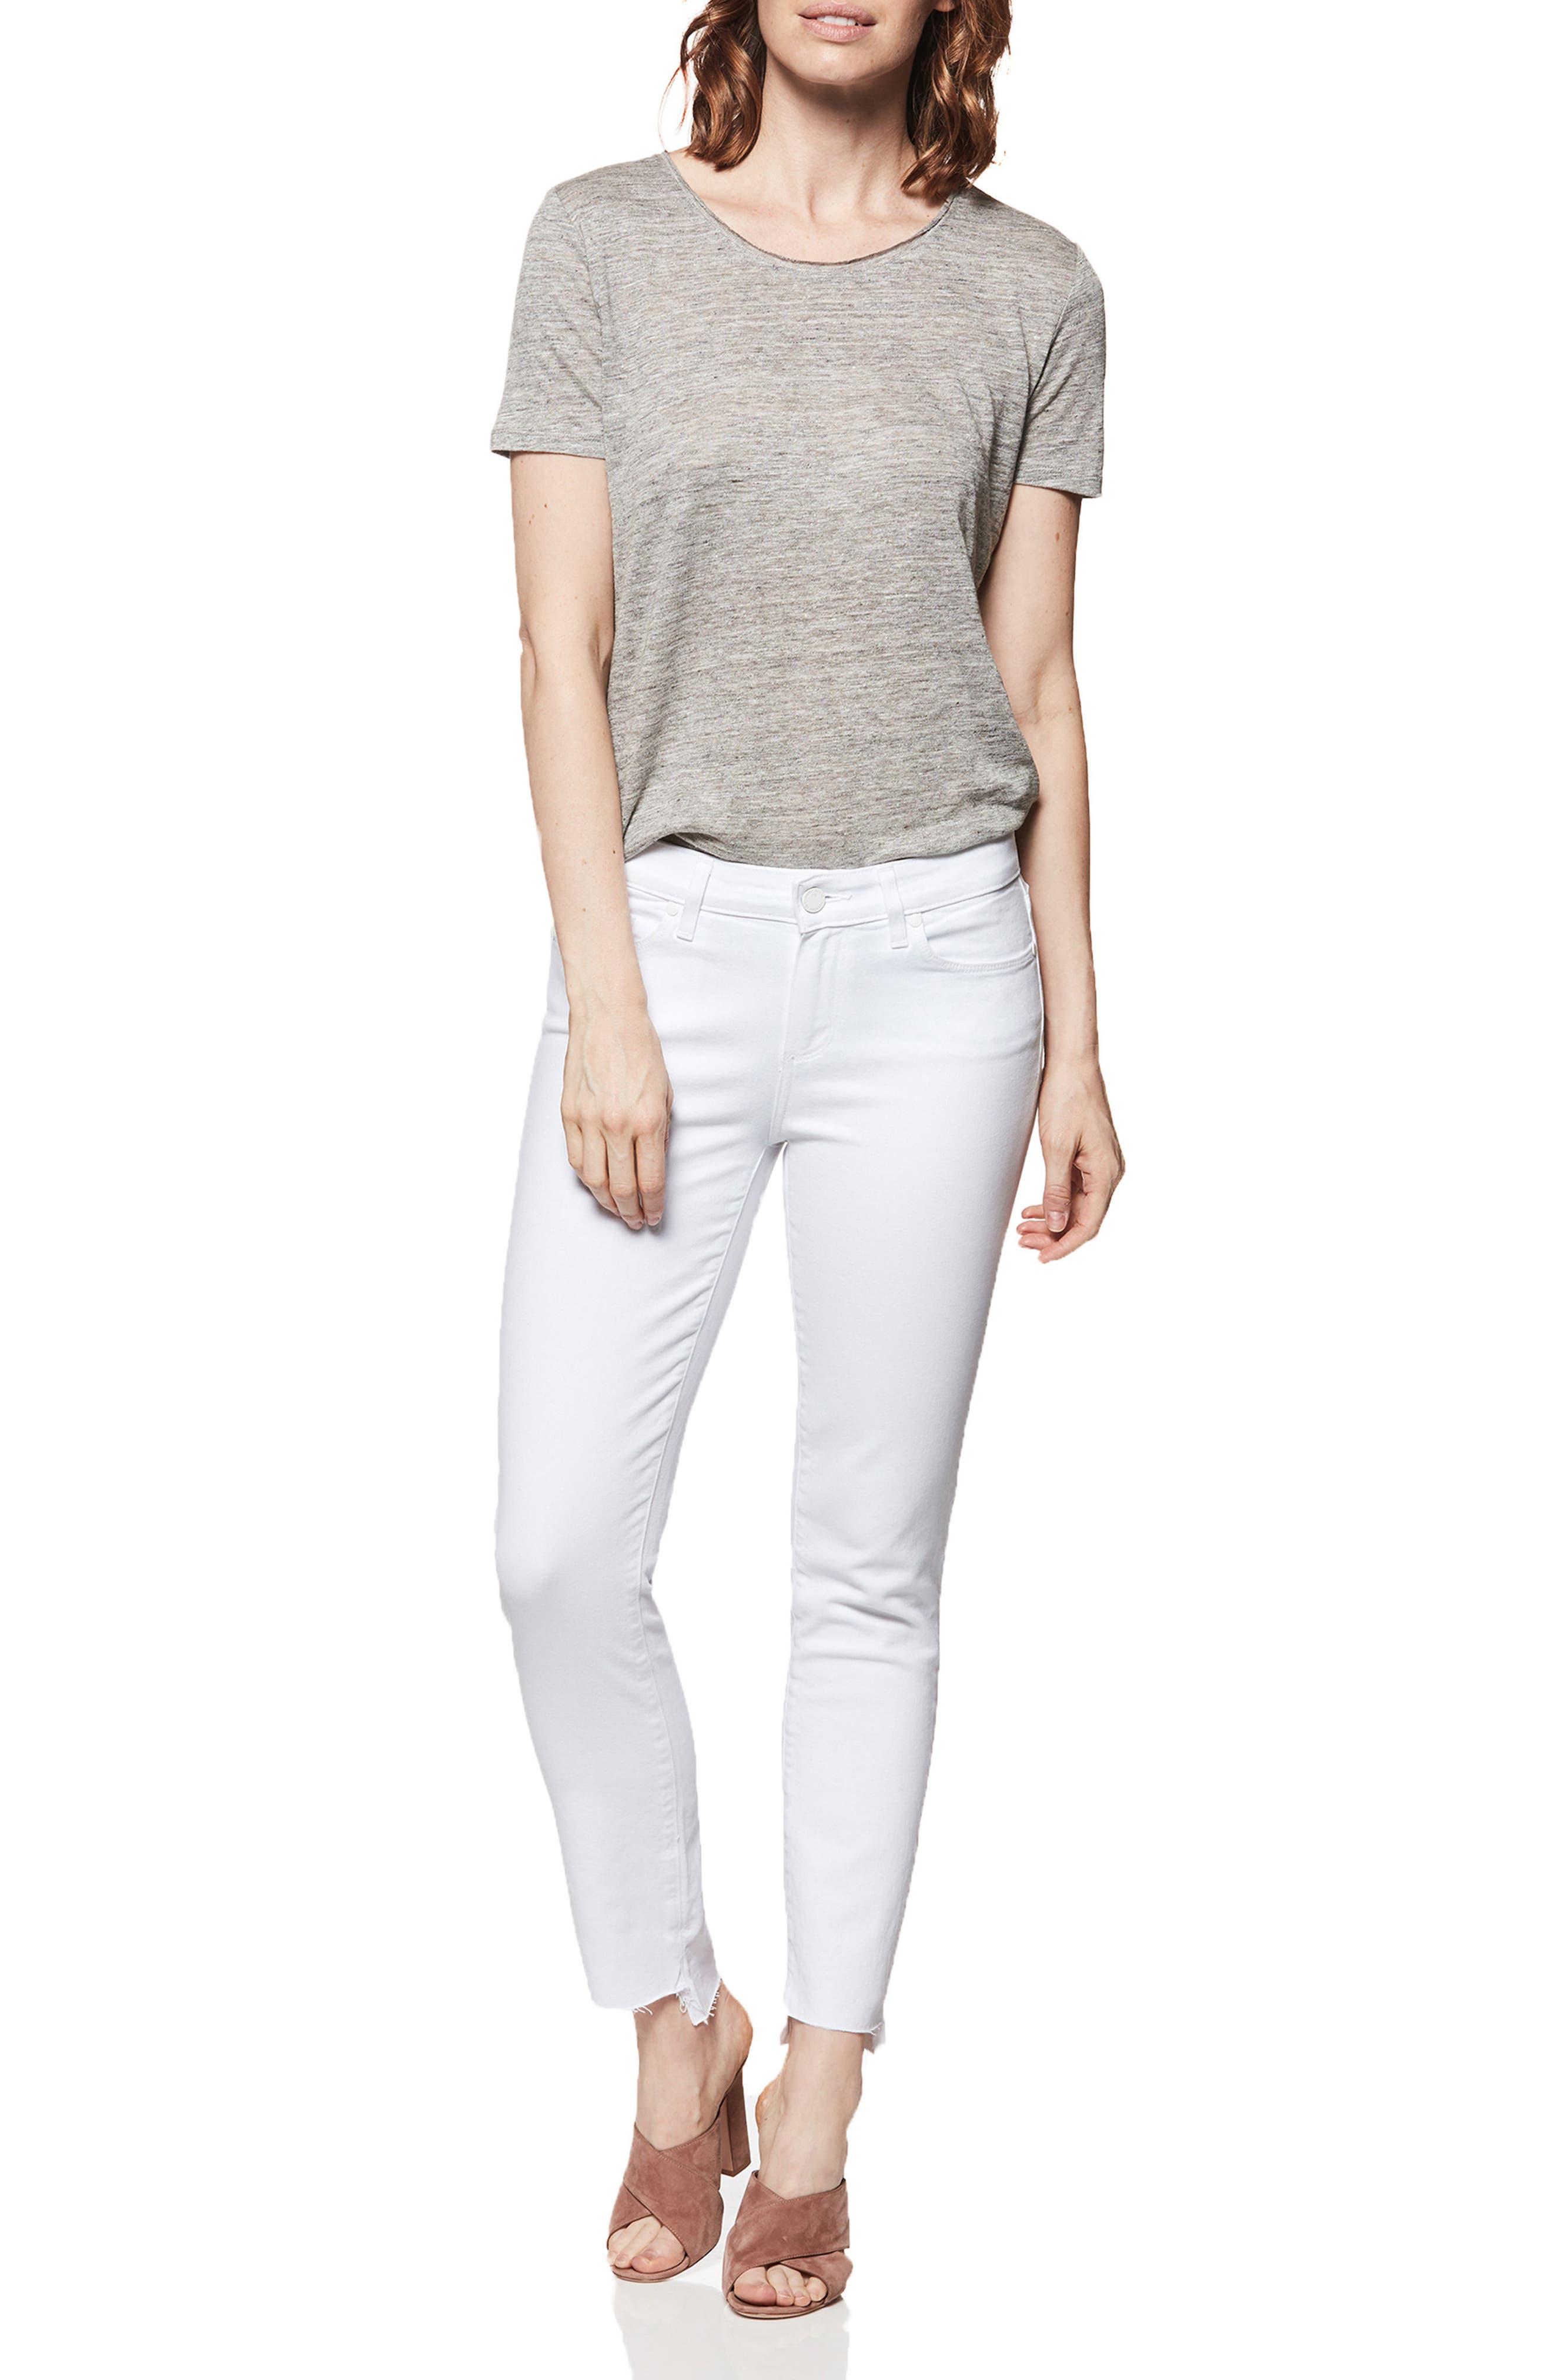 Skyline Ankle Skinny Jeans,                             Alternate thumbnail 3, color,                             100